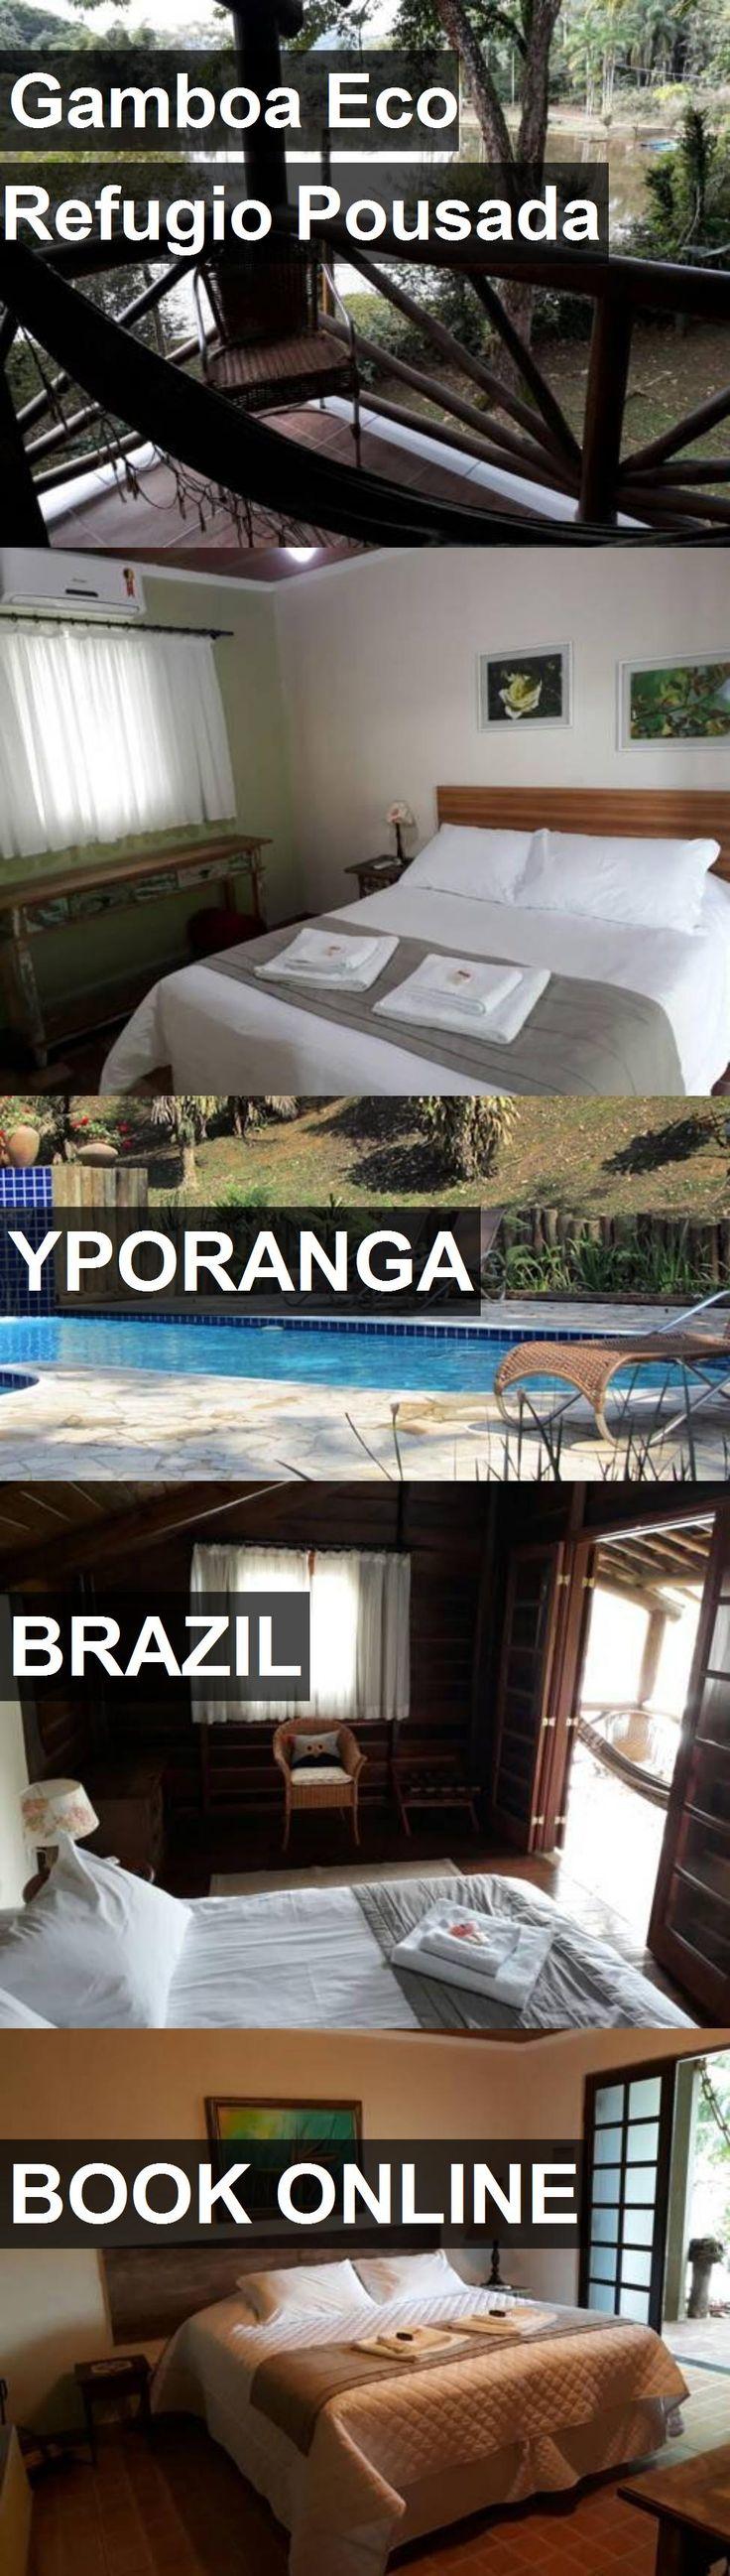 Hotel Gamboa Eco Refugio Pousada in Yporanga, Brazil. For more information, photos, reviews and best prices please follow the link. #Brazil #Yporanga #GamboaEcoRefugioPousada #hotel #travel #vacation